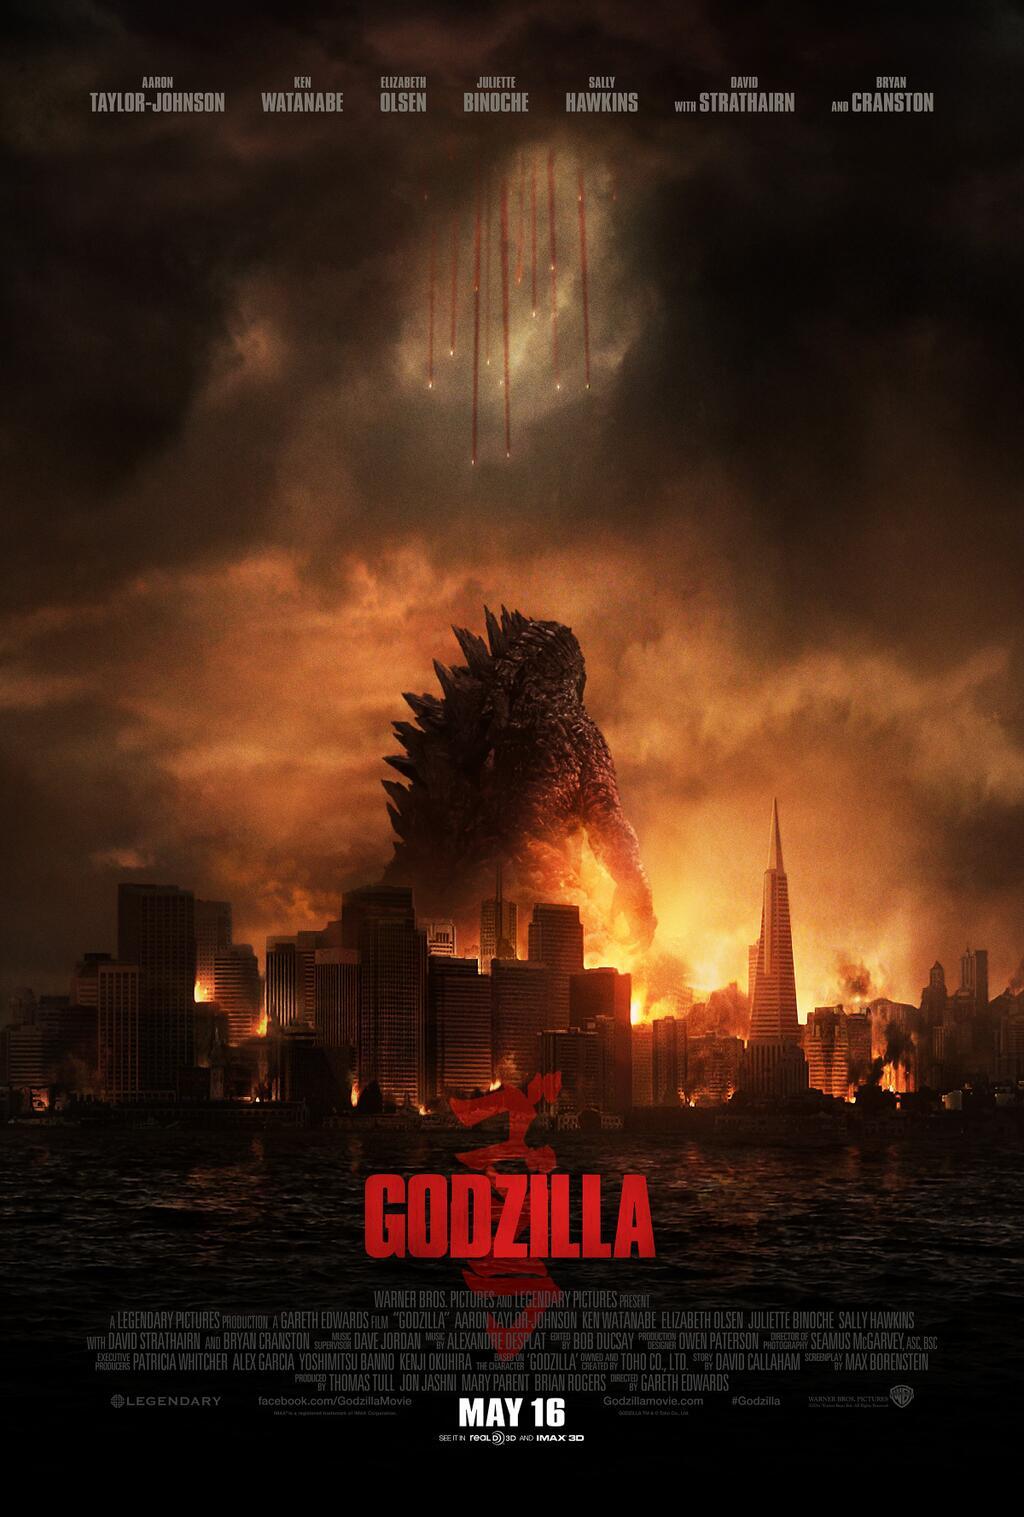 POSTER Godzilla Director- Gareth Edwards Designed by Kyle Cooper for Prologue Films